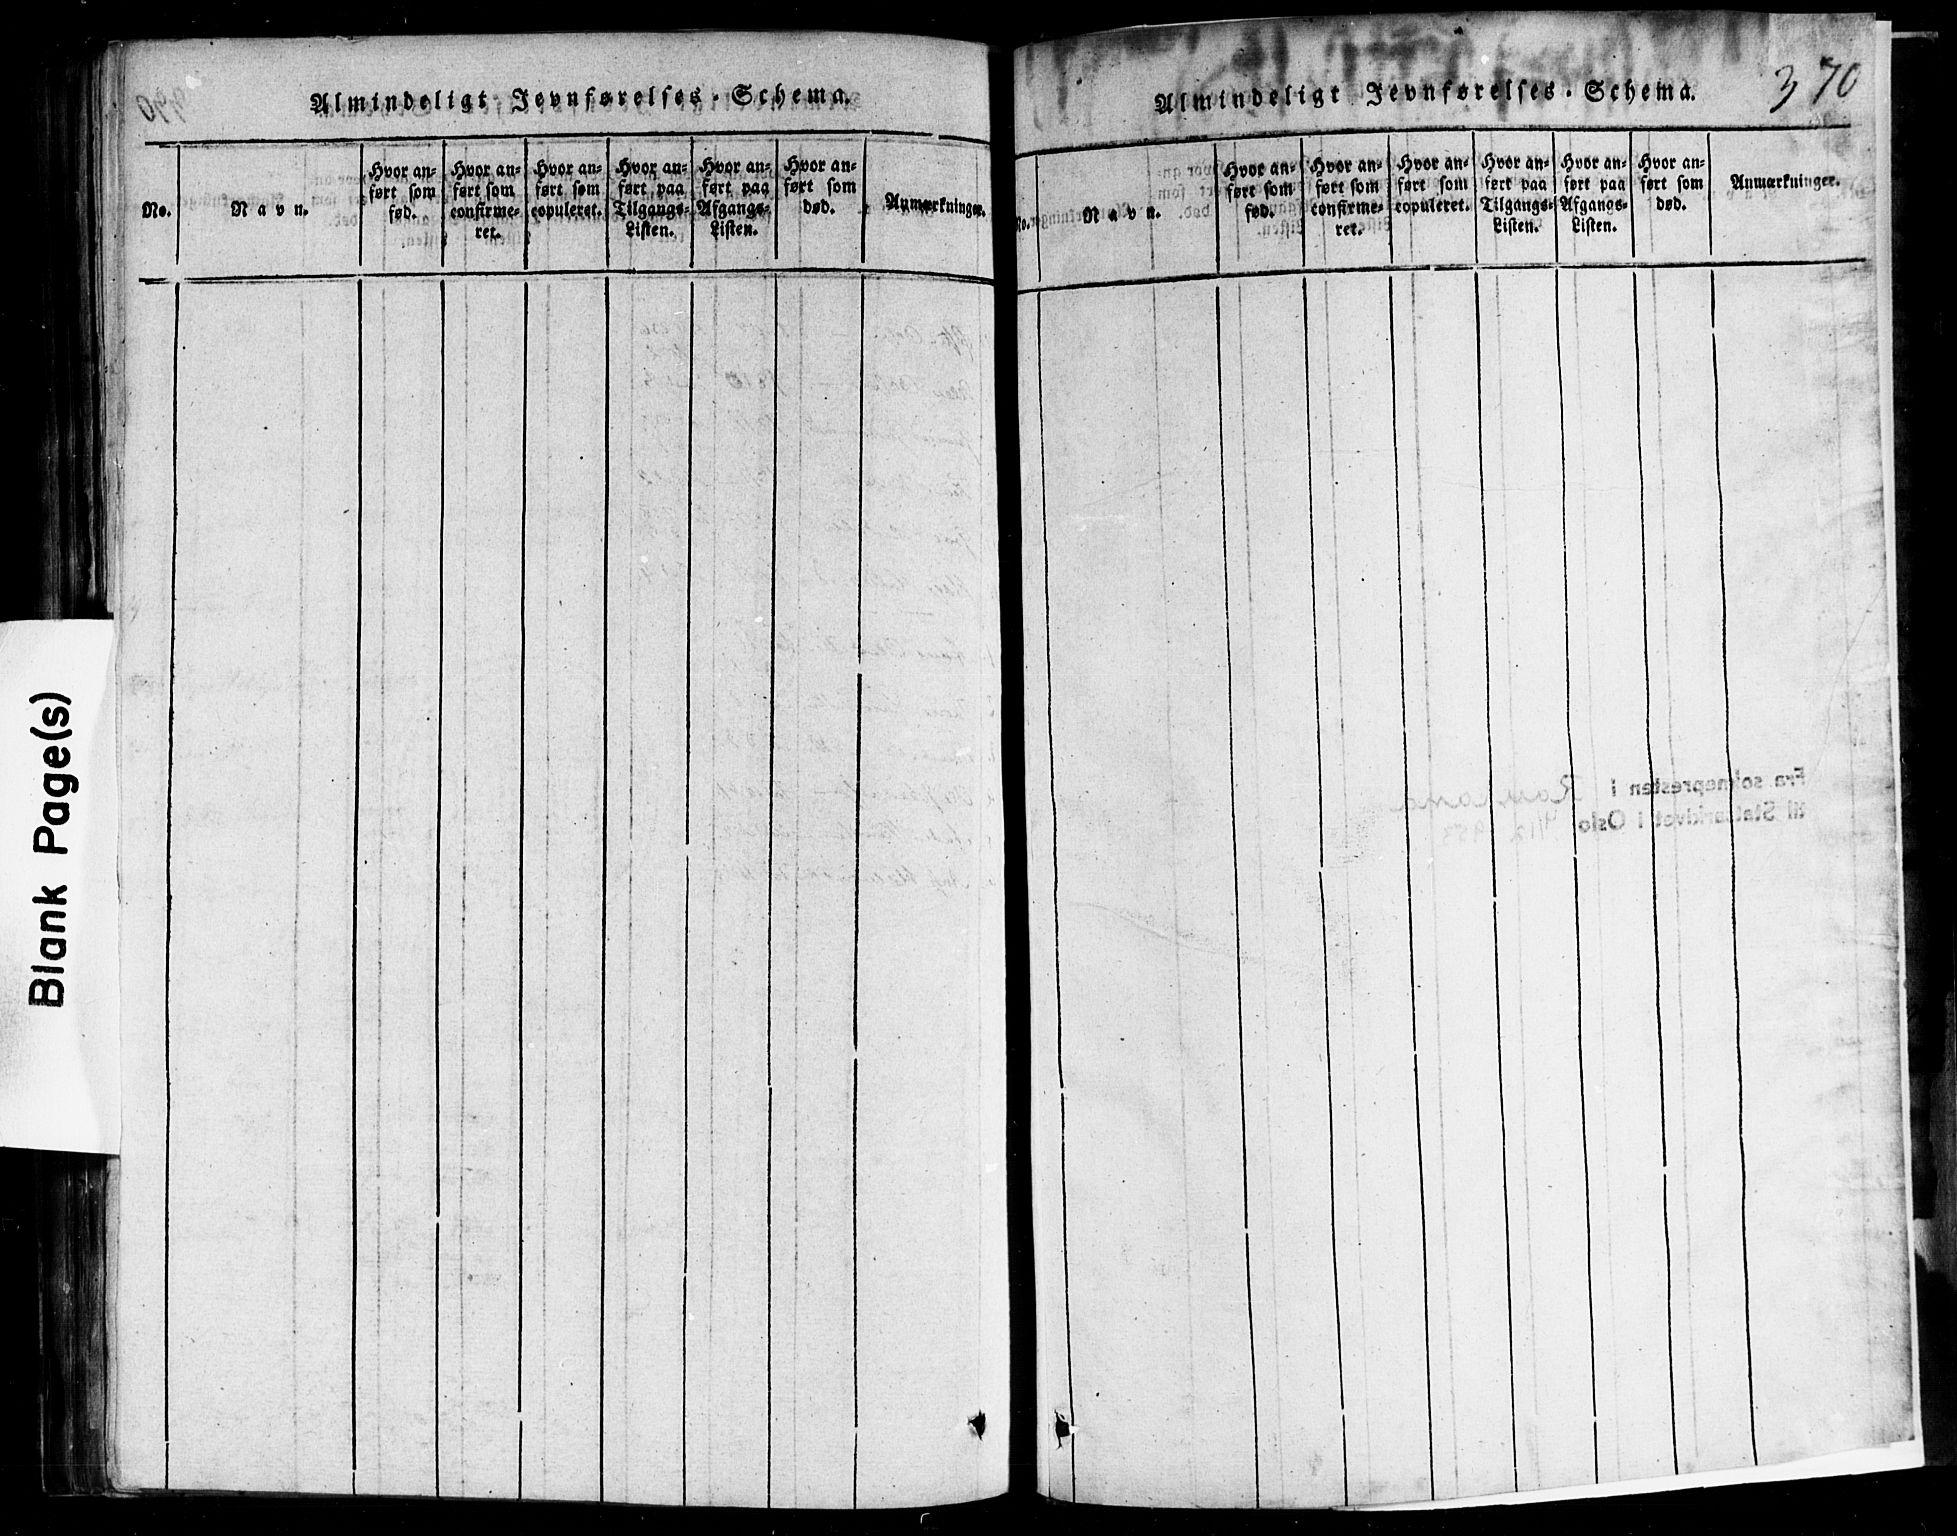 SAKO, Rauland kirkebøker, F/Fa/L0002: Ministerialbok nr. 2, 1815-1860, s. 370